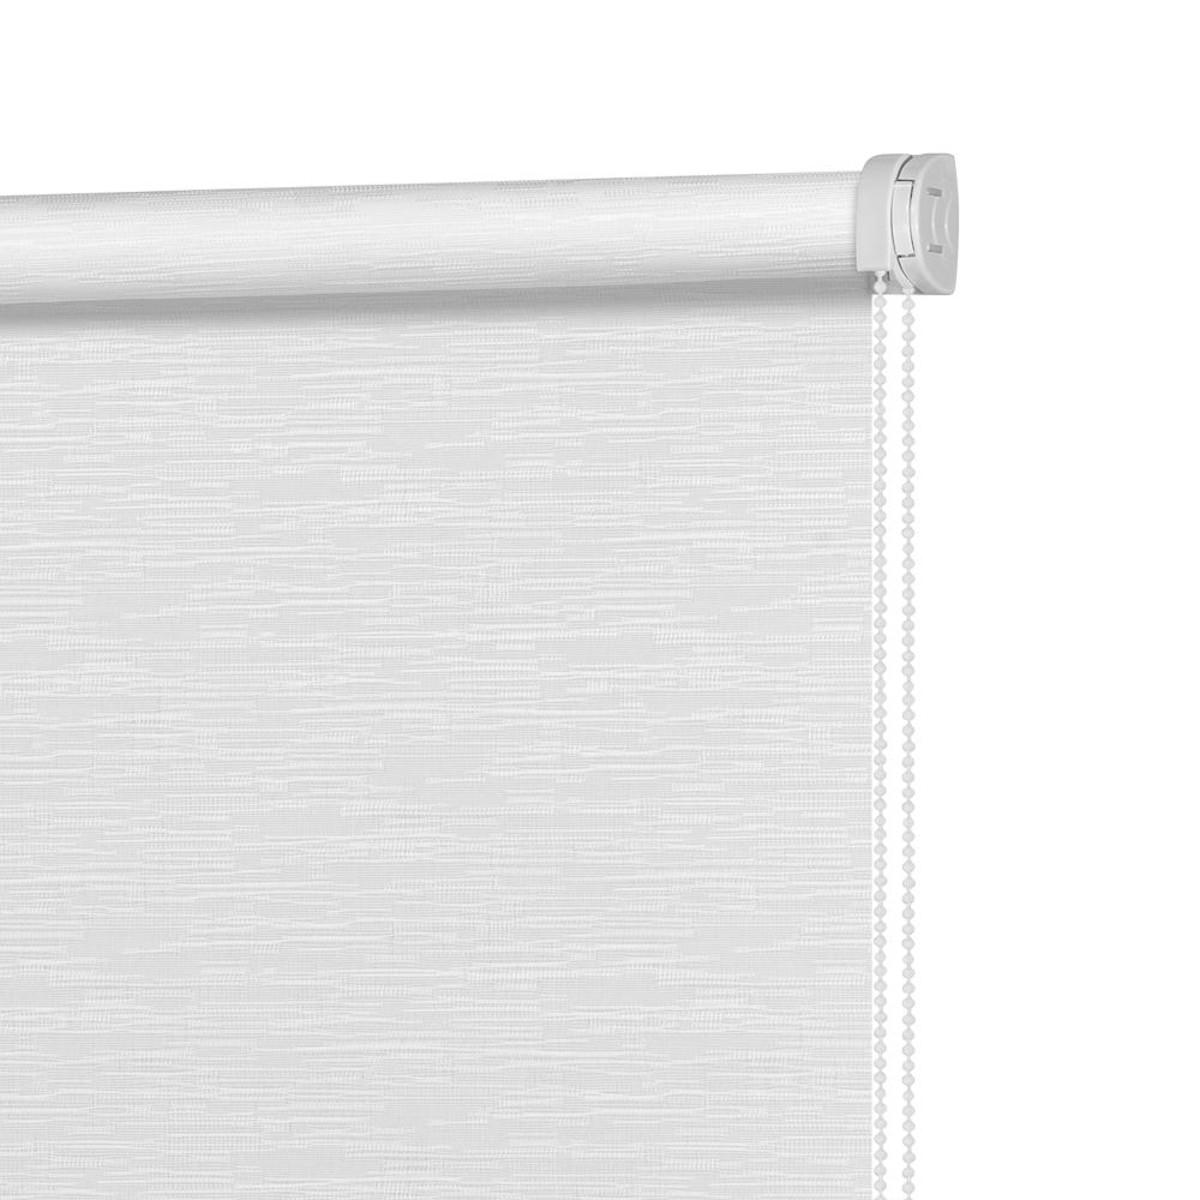 Рулонная Ора Decofest Эко 40Х160 Цвет Белый